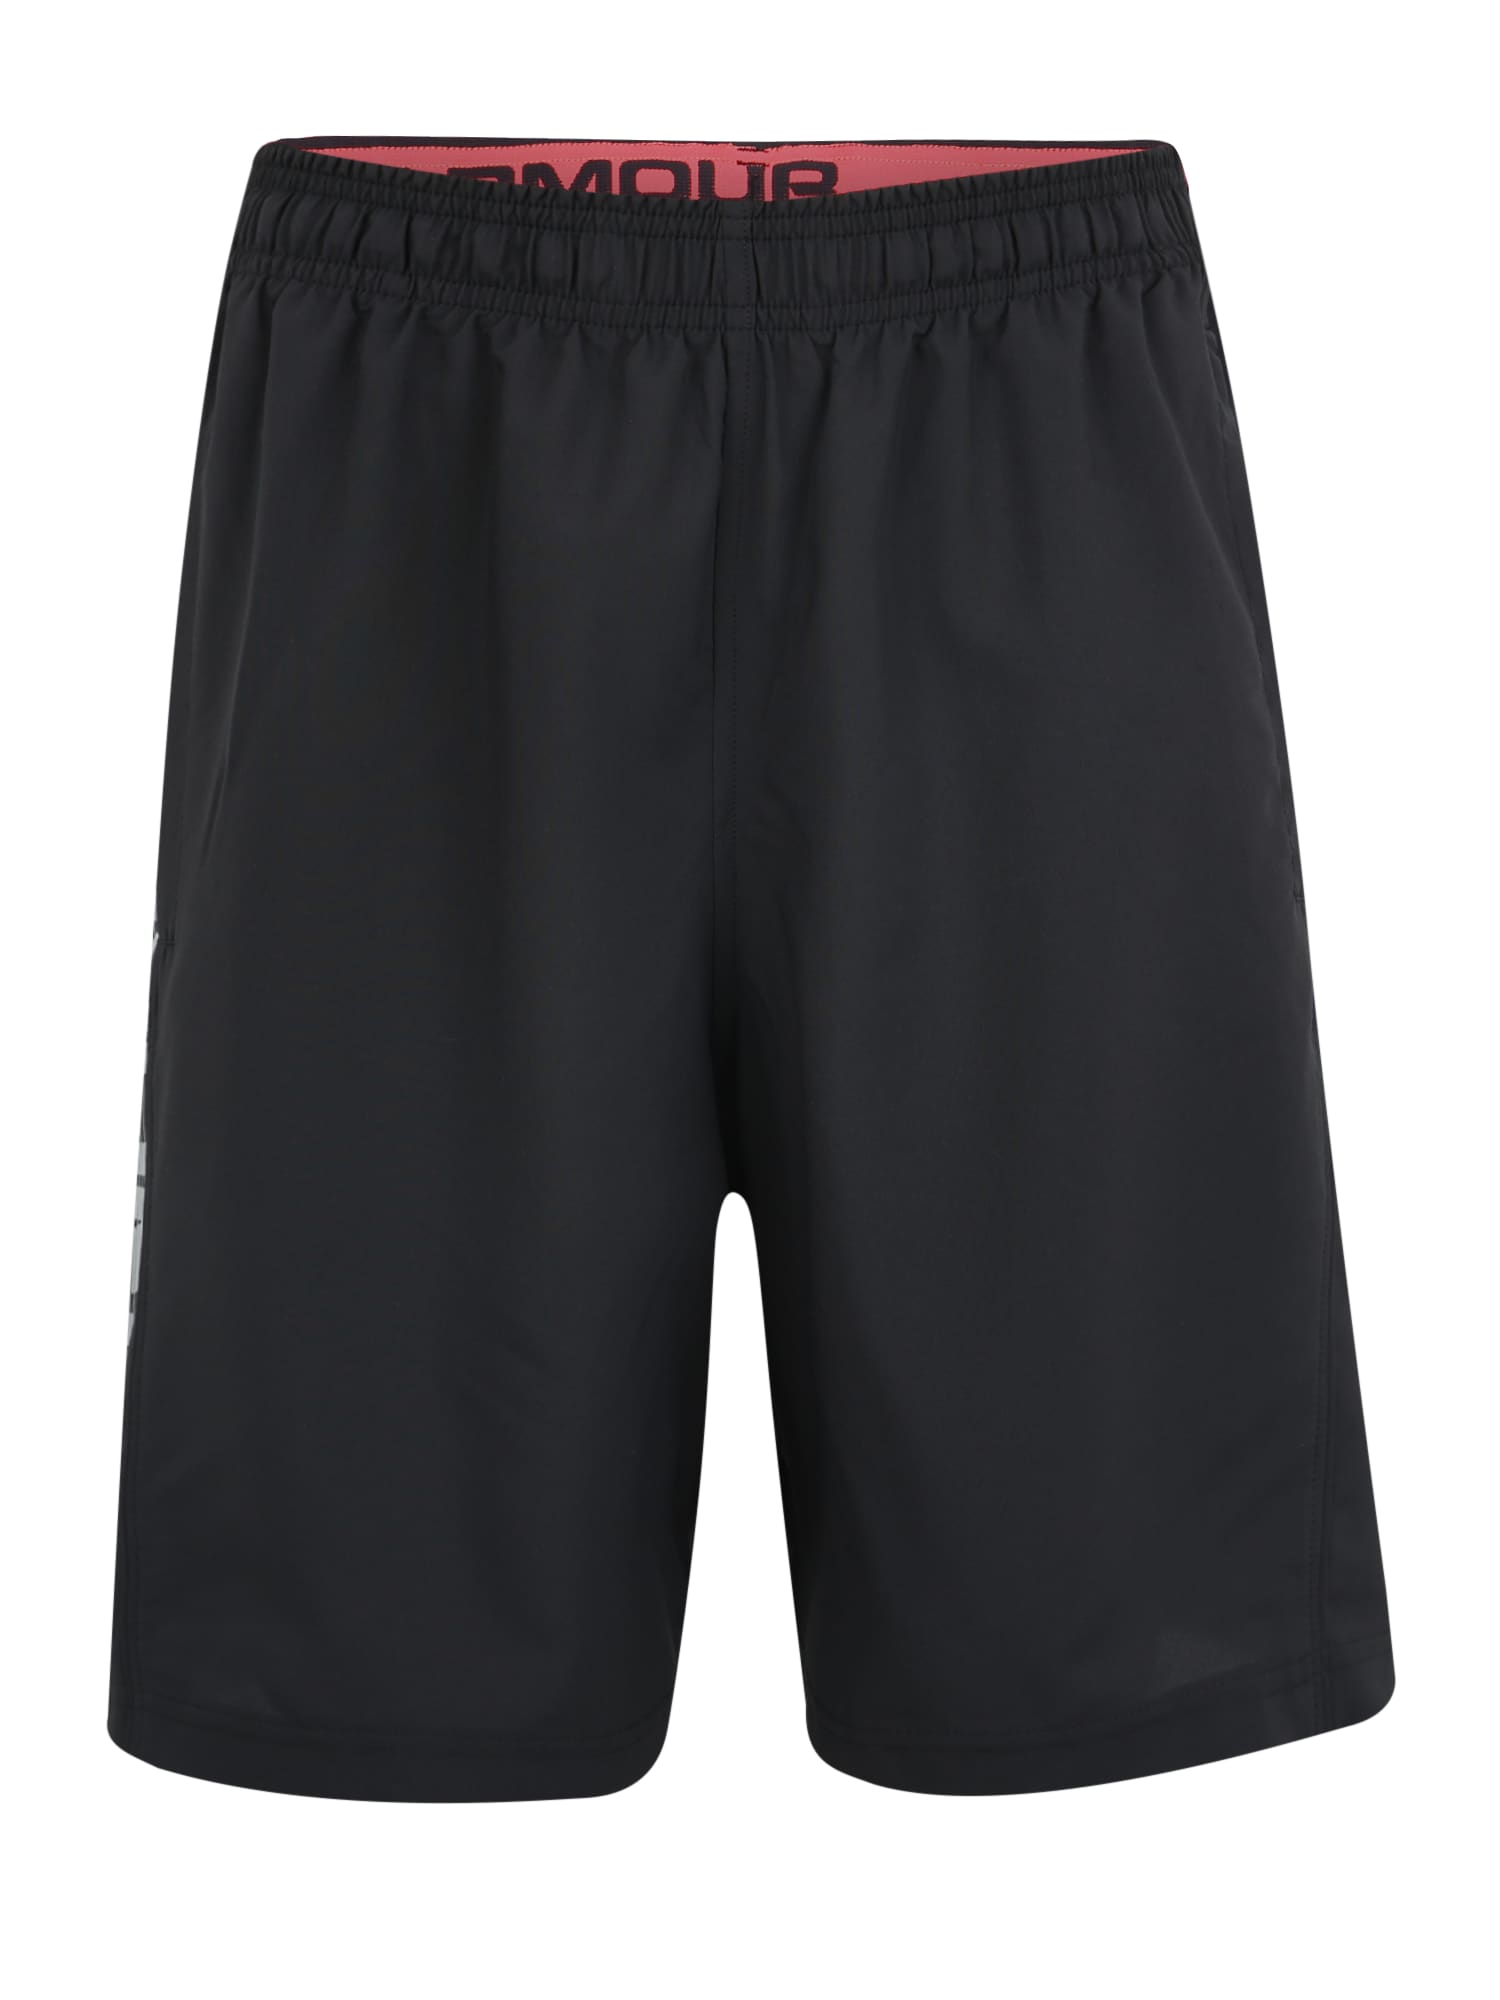 UNDER ARMOUR Športové nohavice  čierna / sivá / červená